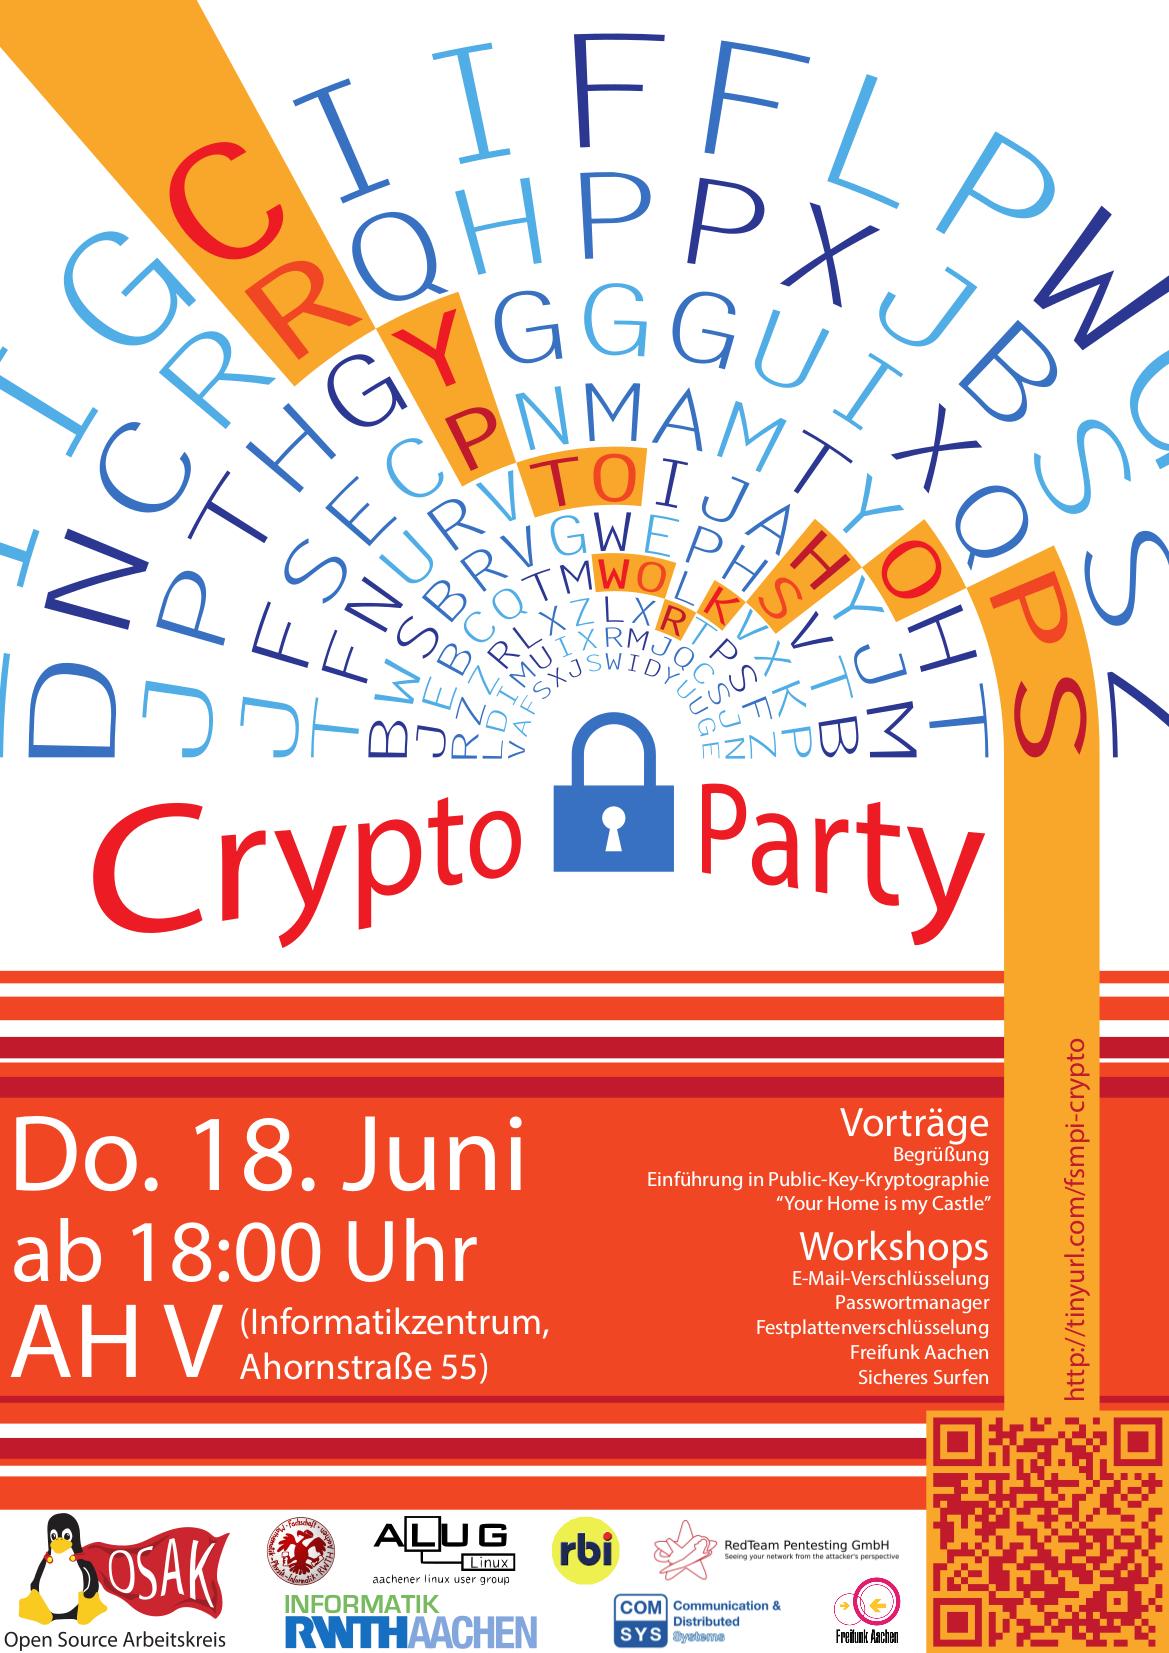 Single party aachen 2015